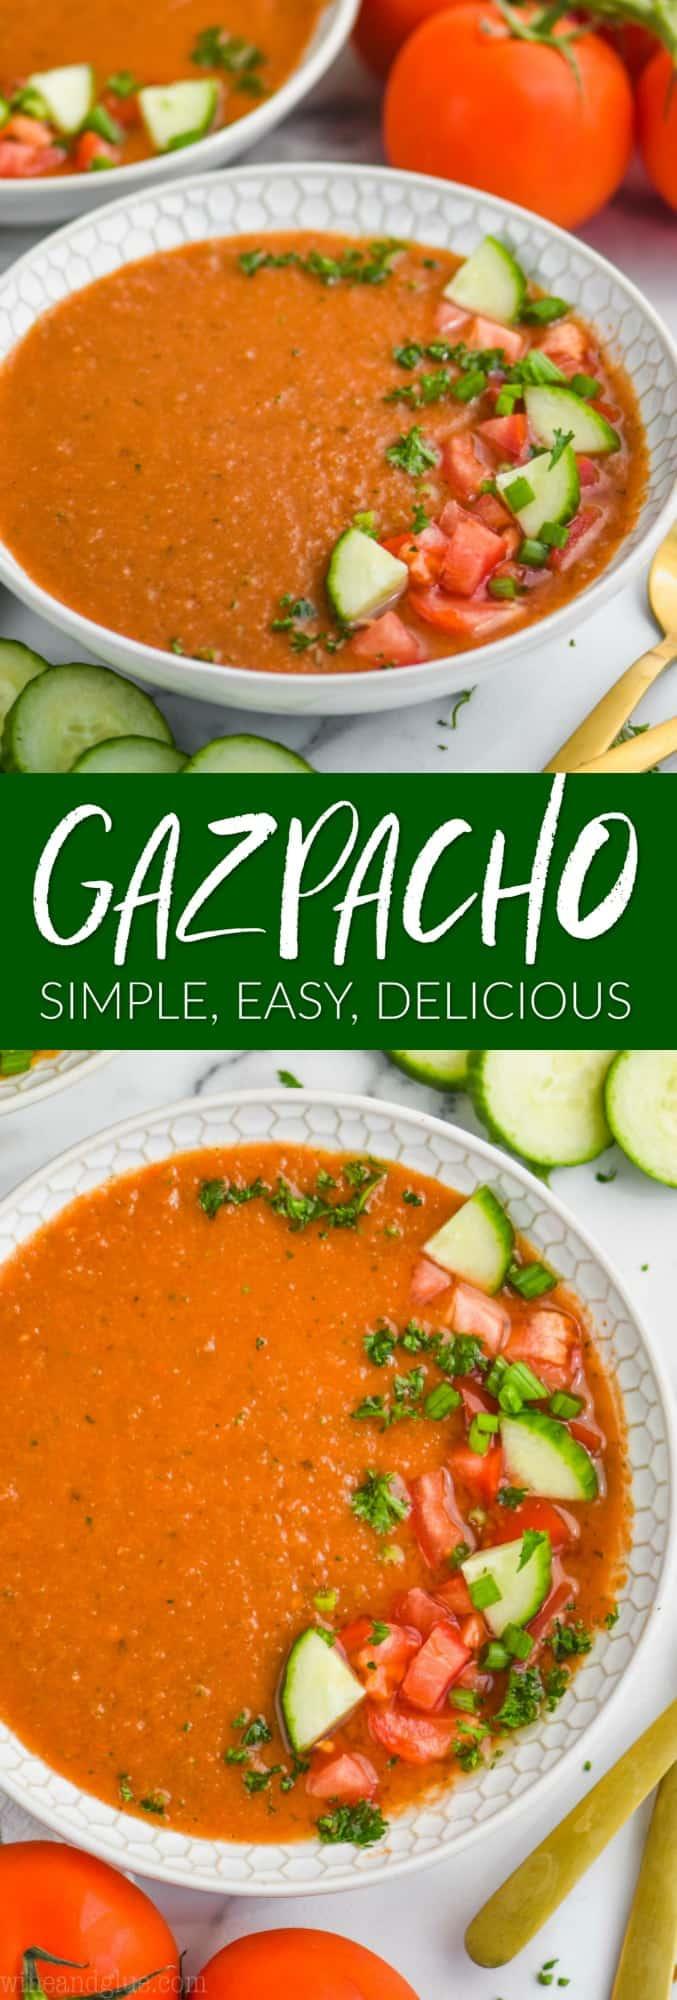 collage of photos of gazpacho recipe